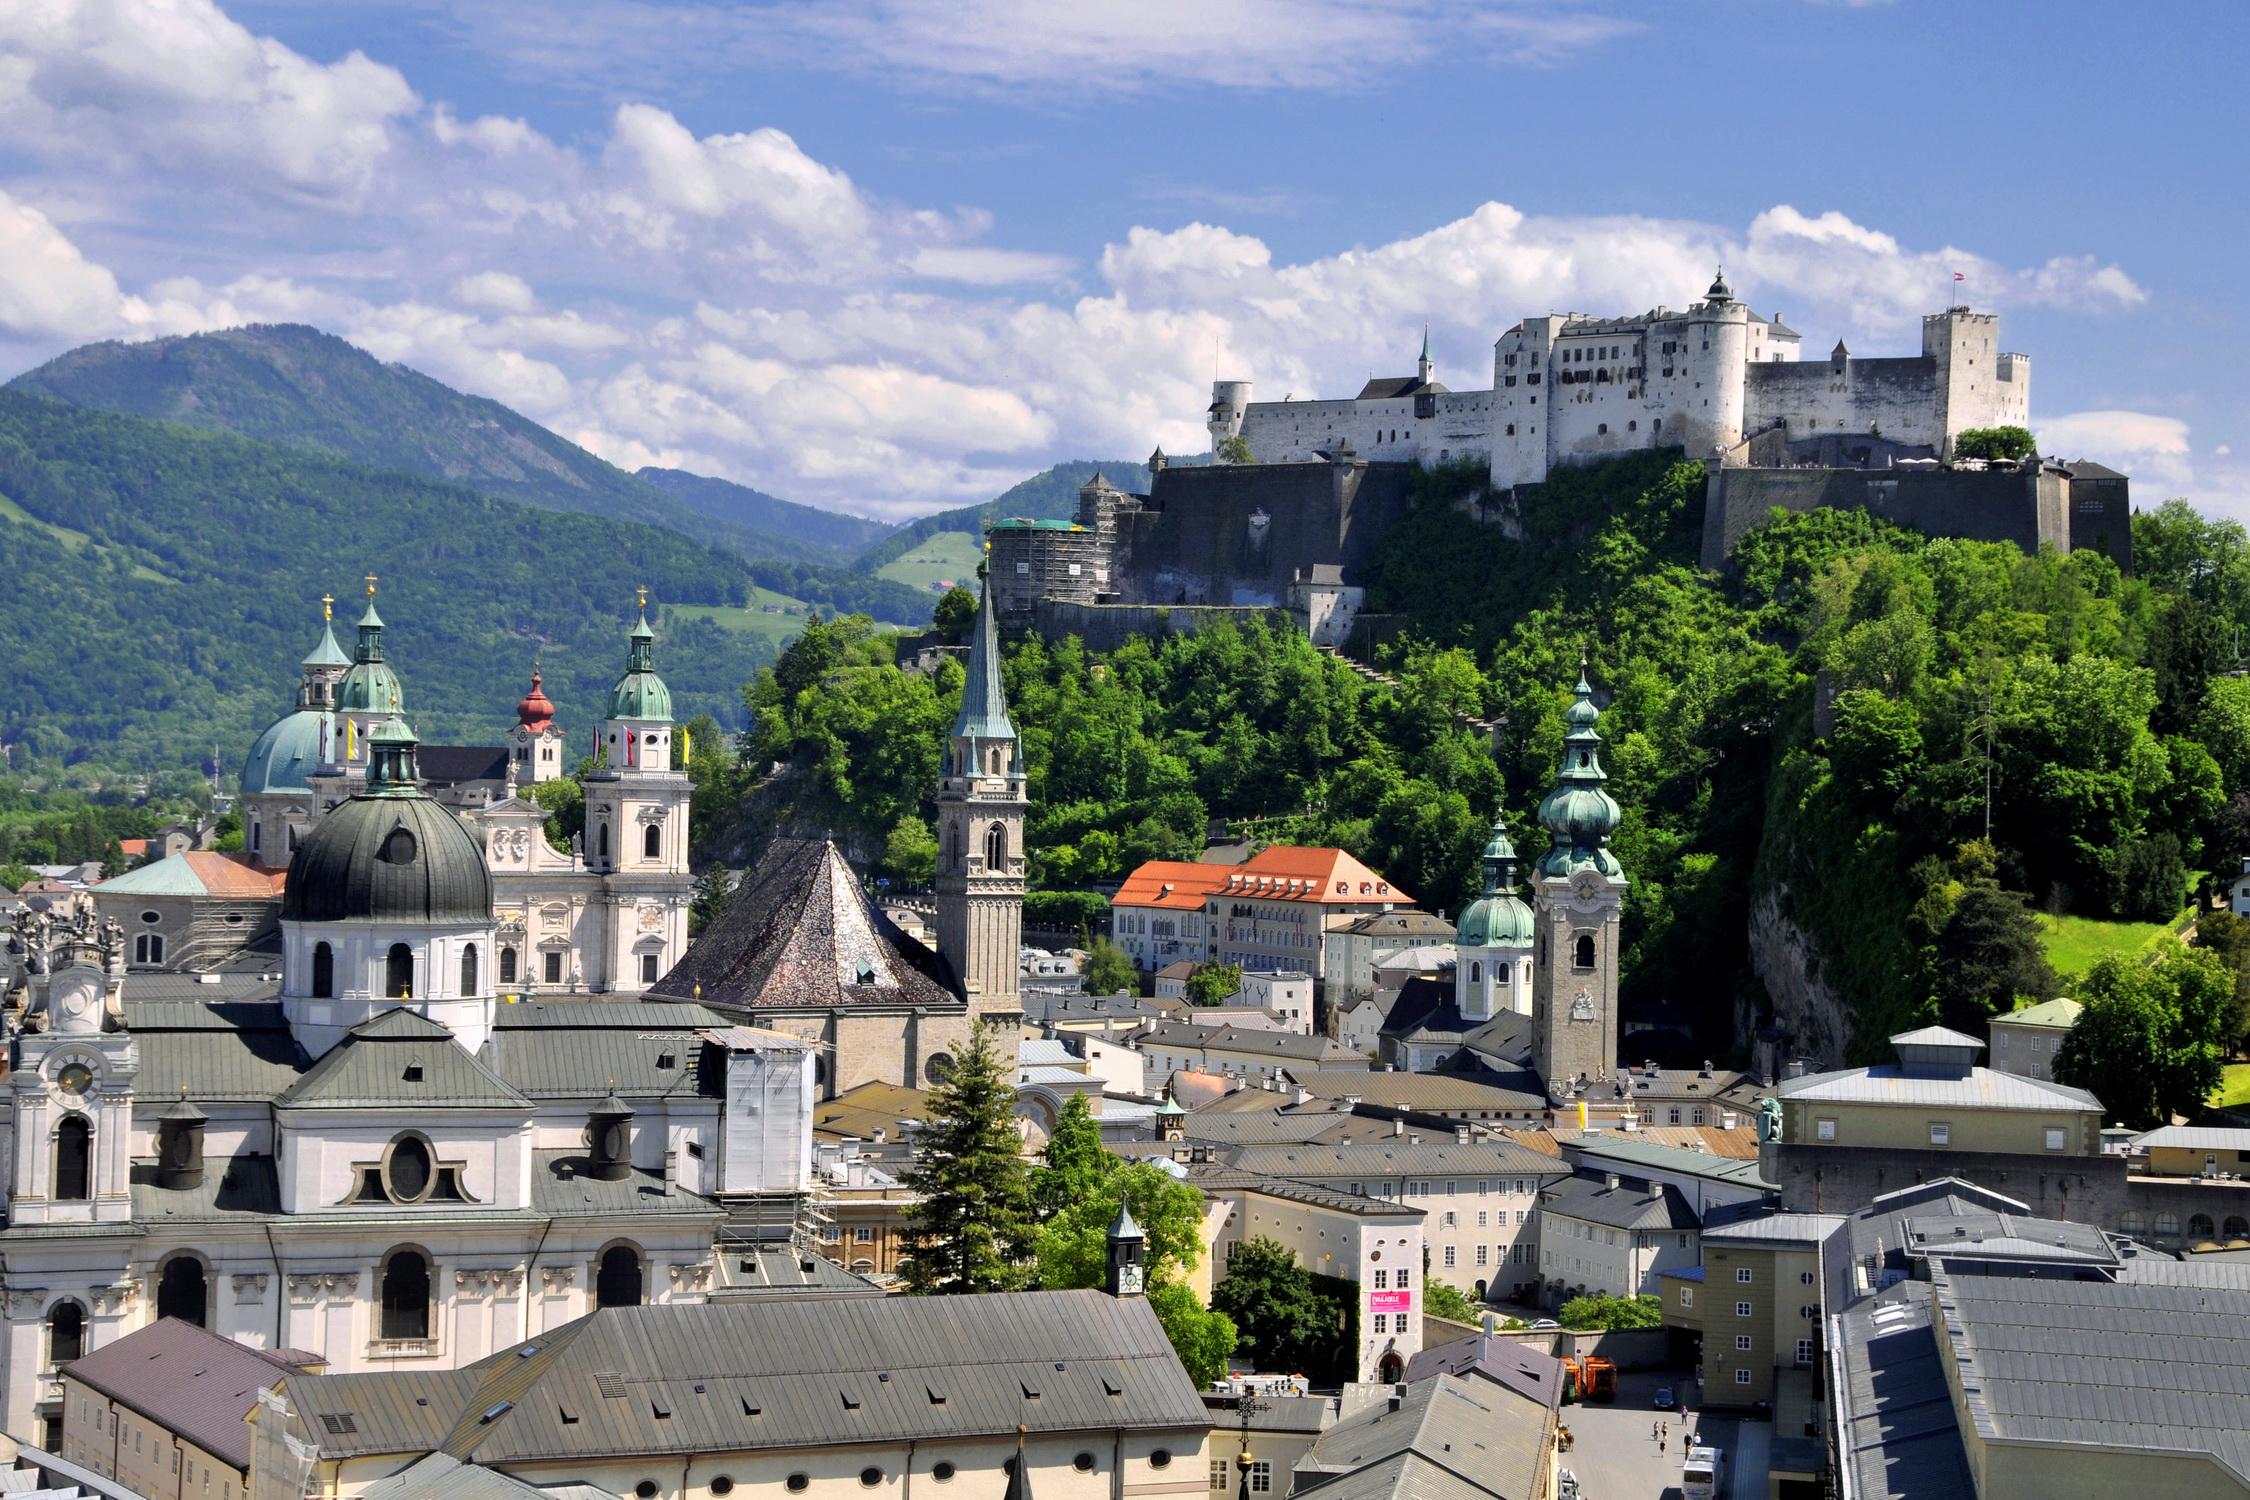 Austria Salzburg HD Wallpaper Background Image 2250x1500 ID 2250x1500